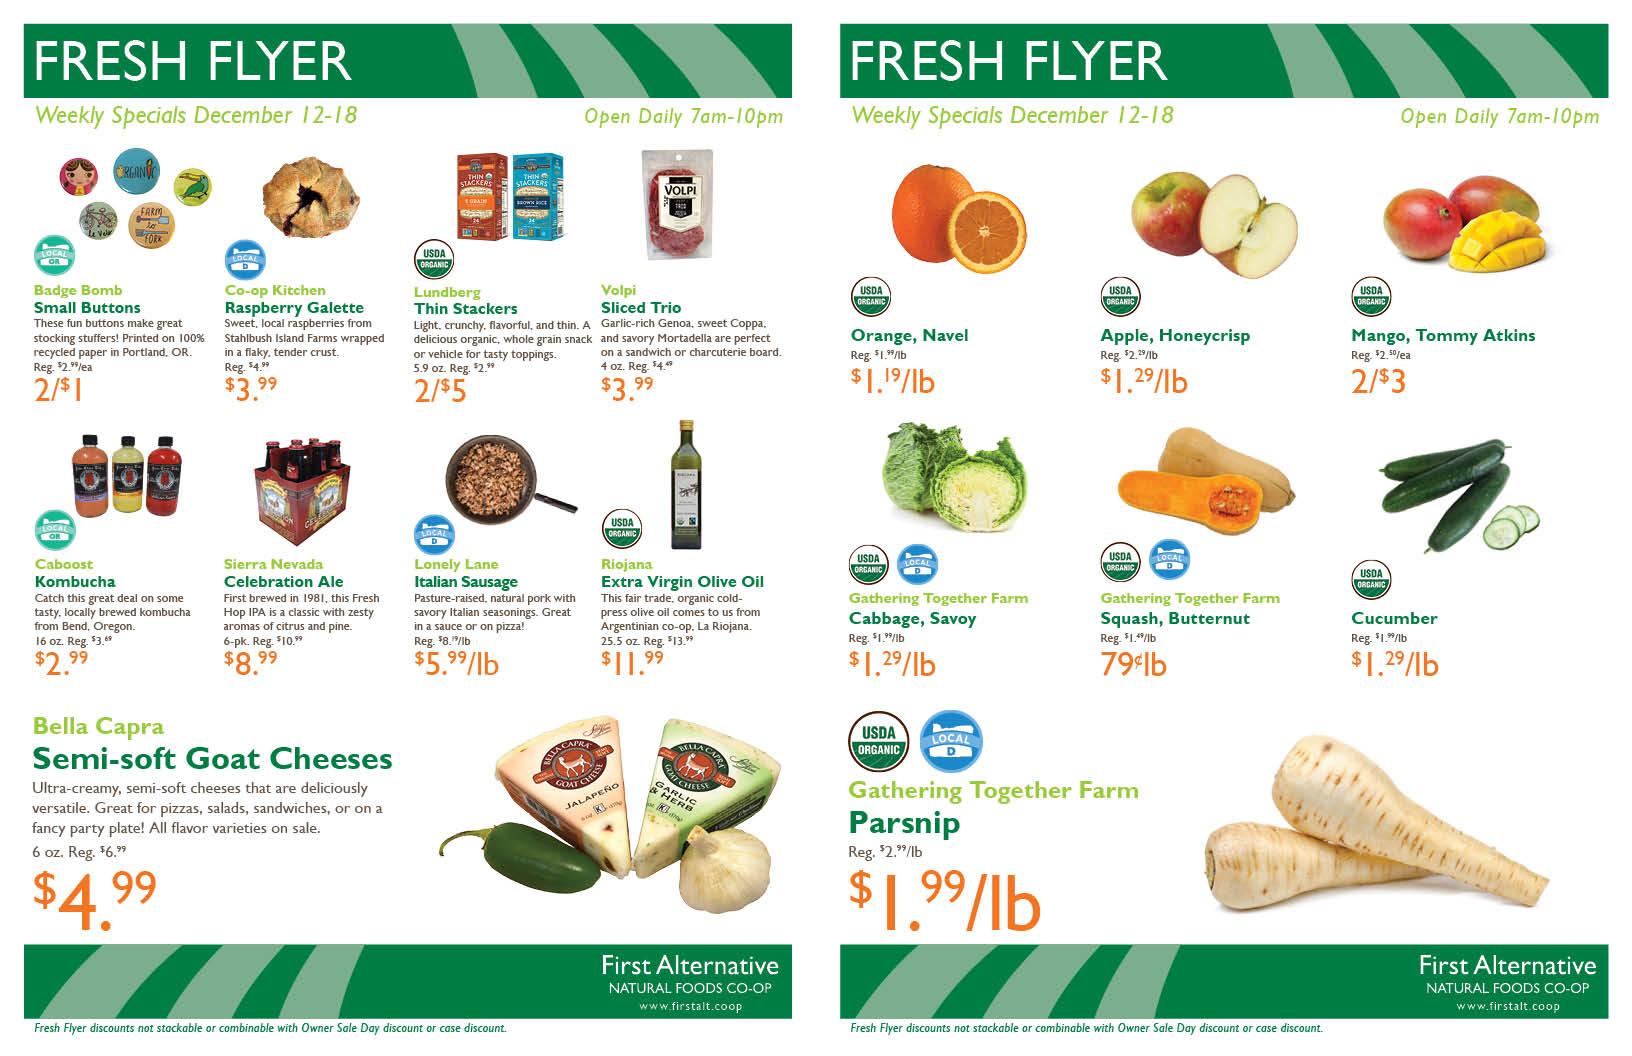 First Alternative Fresh Flyer Dec 12-18